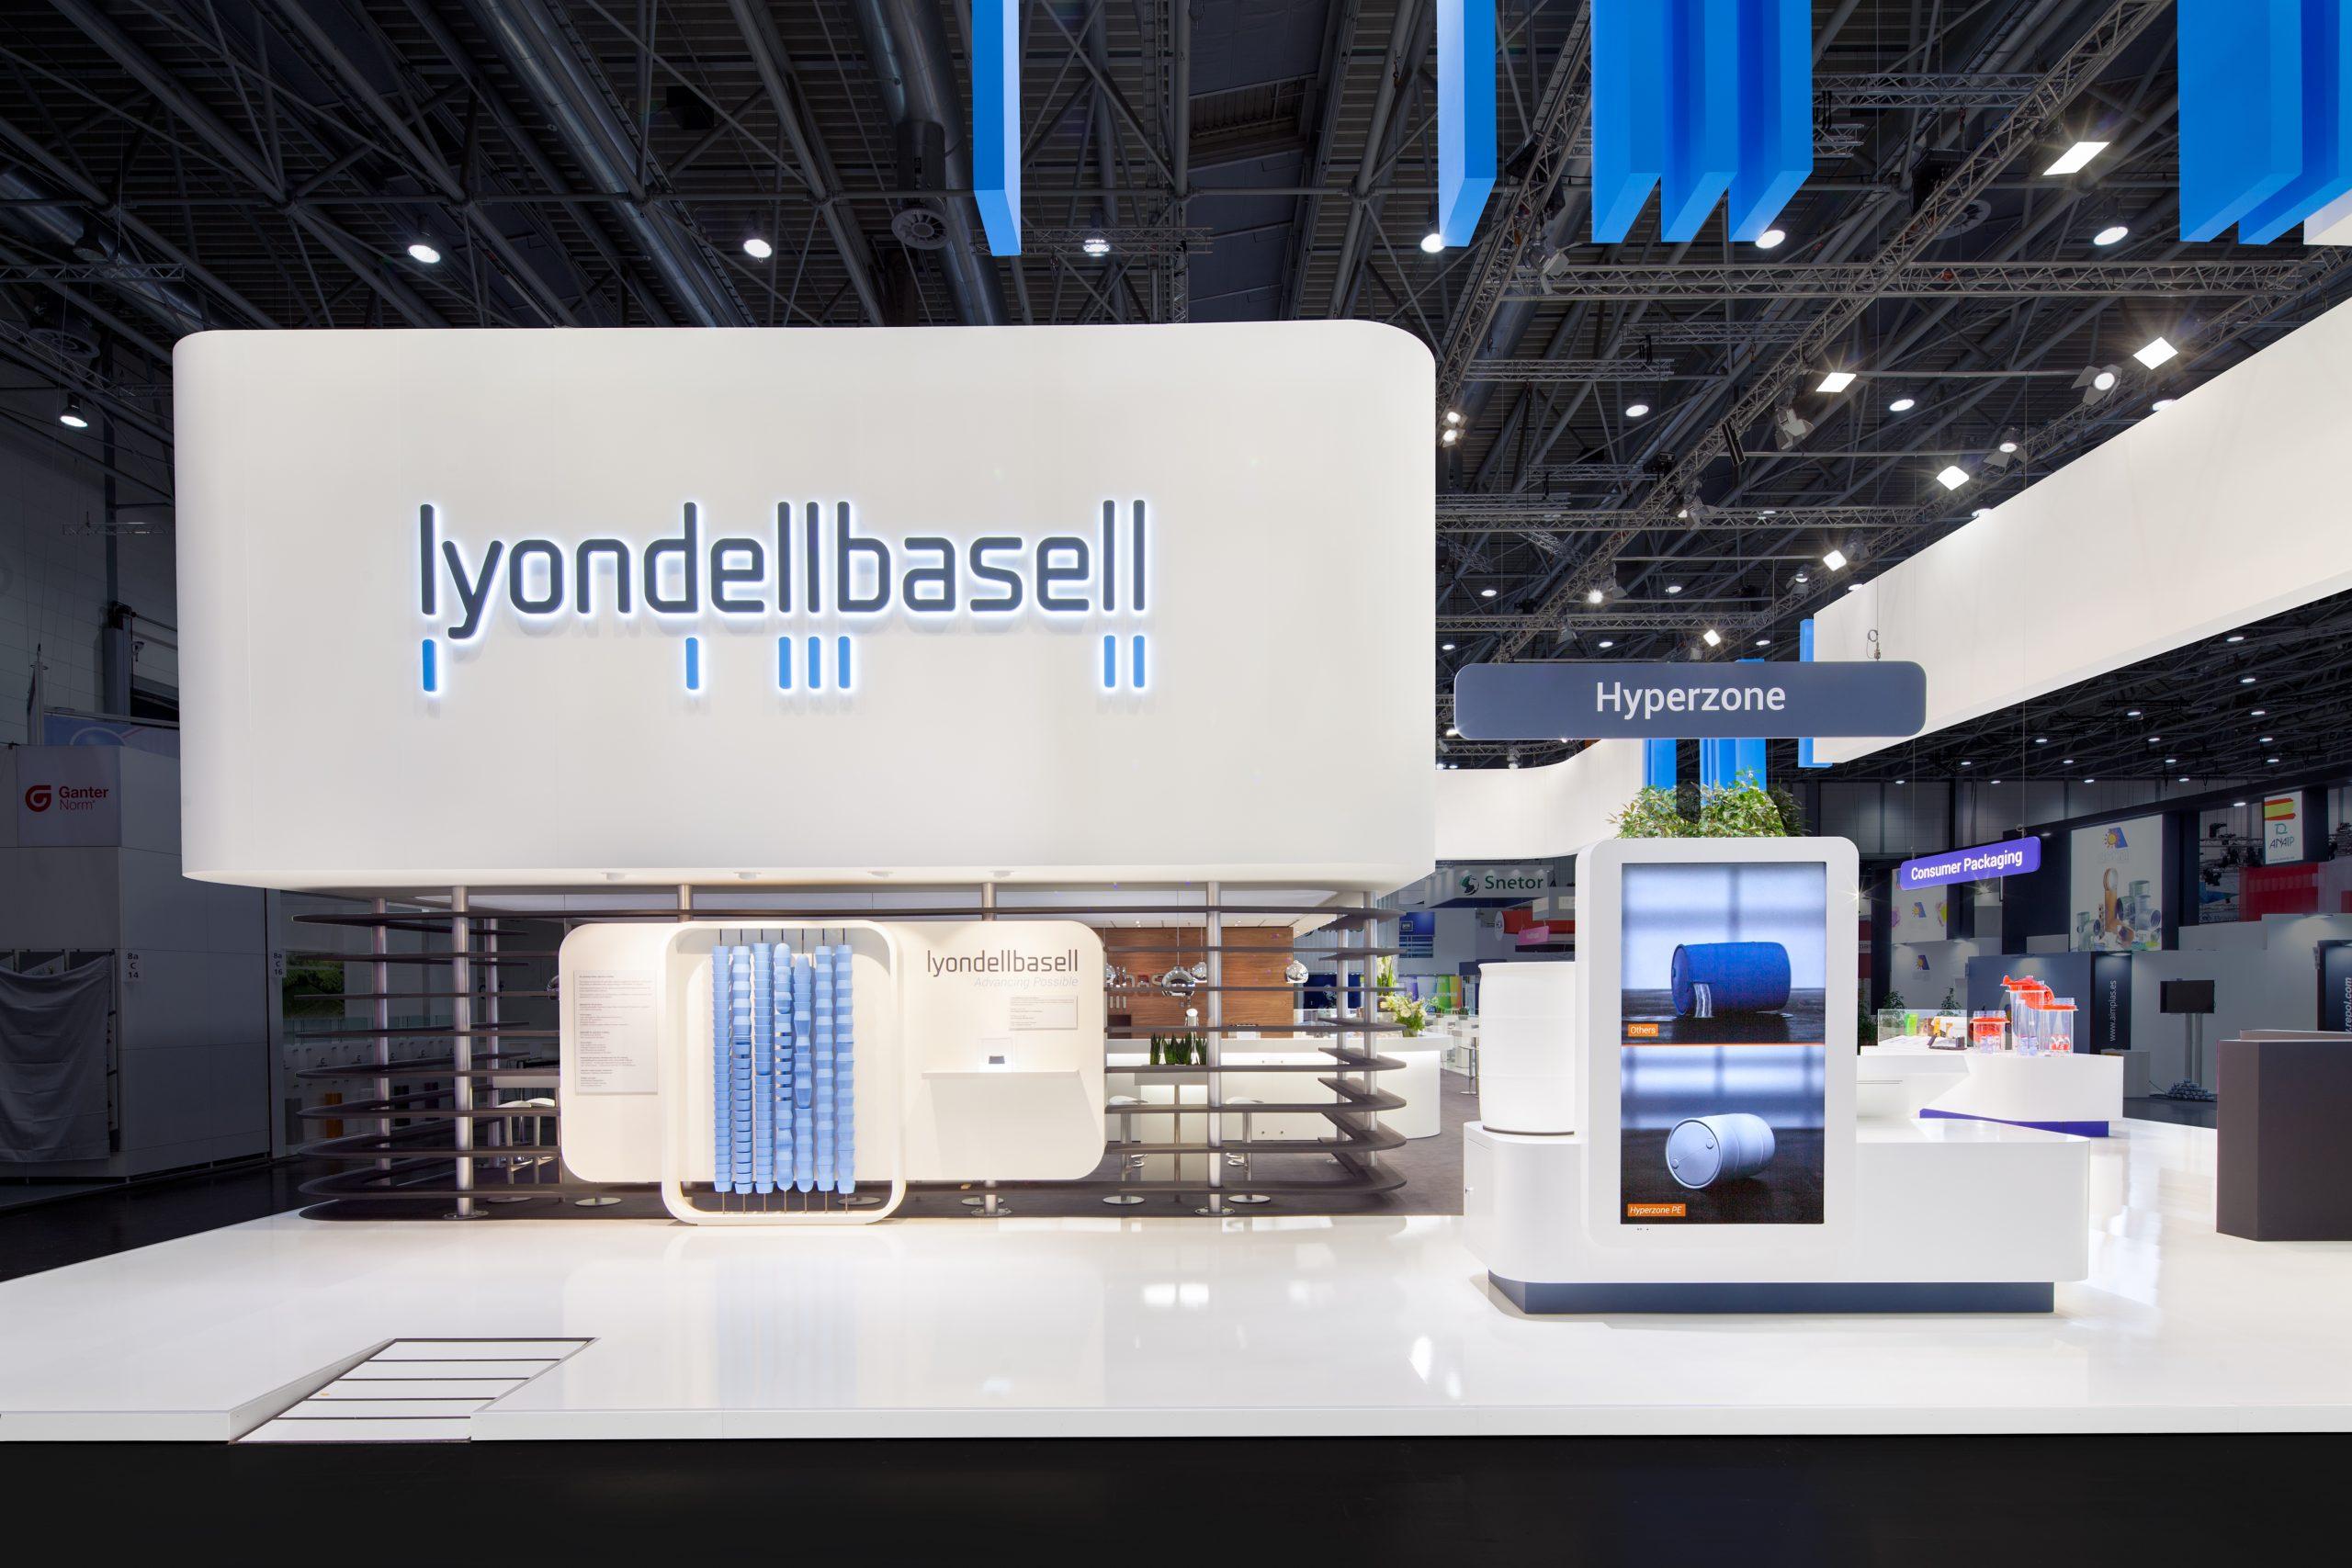 3 CAS Exhibition Partners - Lyondellbasell - K 2019 - Düsseldorf - Standbouwfotografie #9345